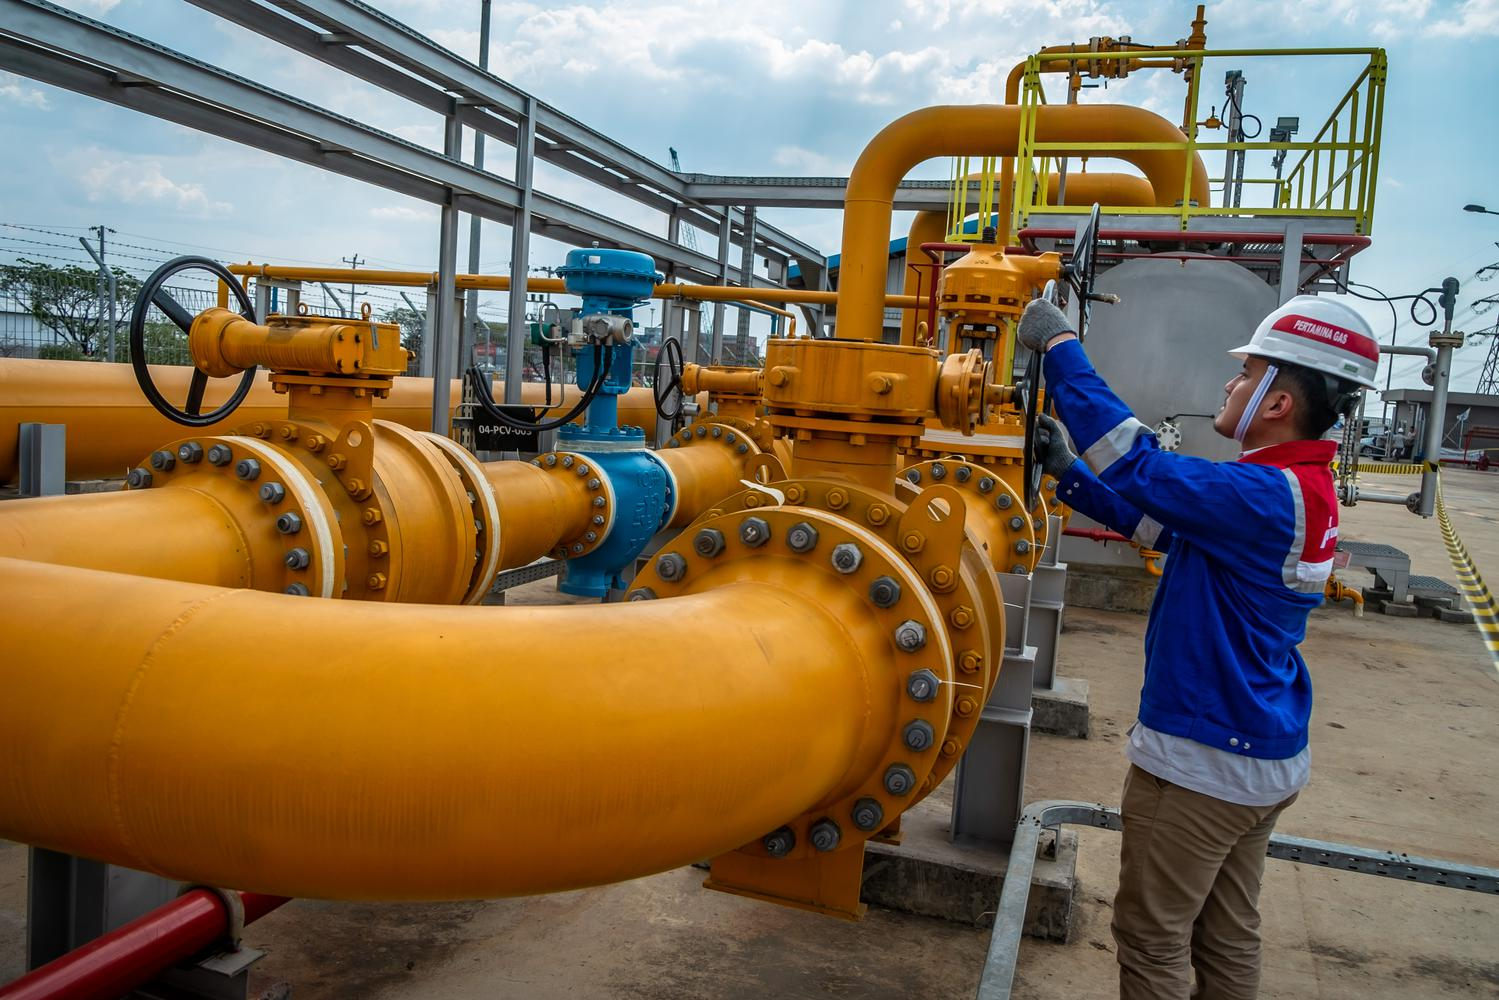 cadangan gas, infrastruktur gas, target produksi gas, iatmi